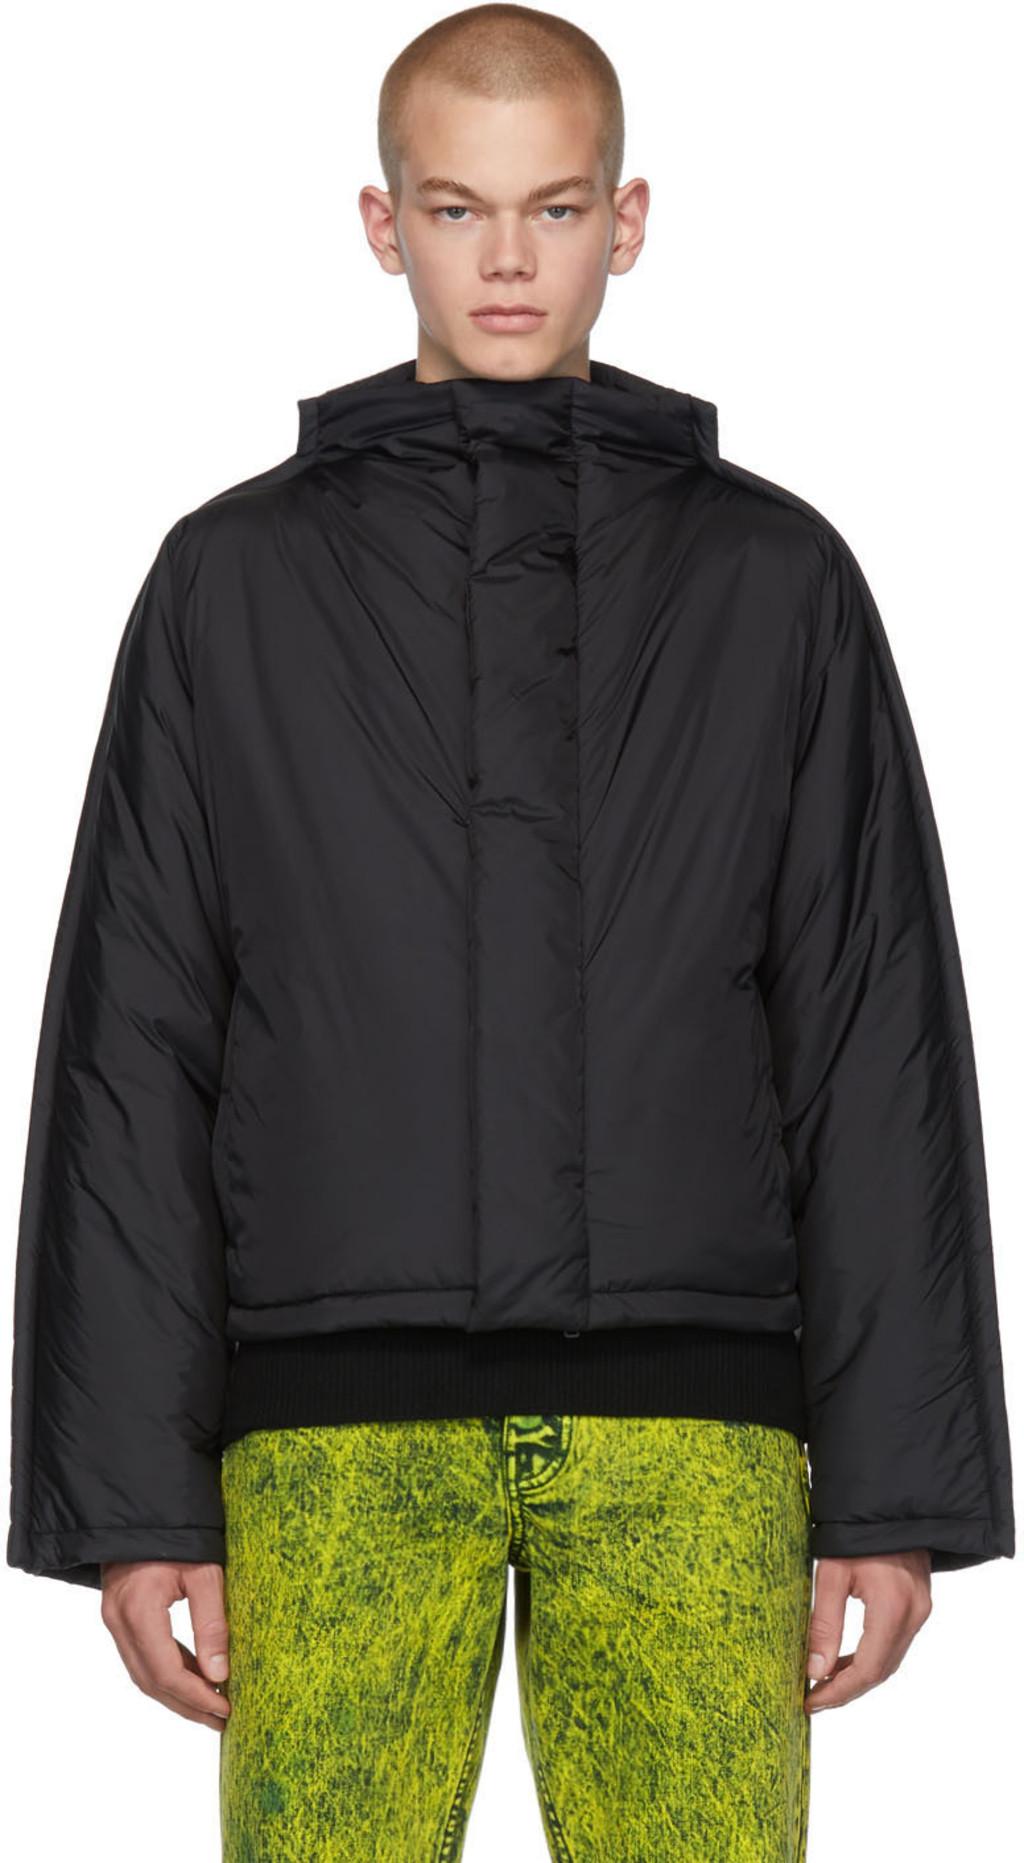 c28506133 Black Water-Repellent Nylon Jacket